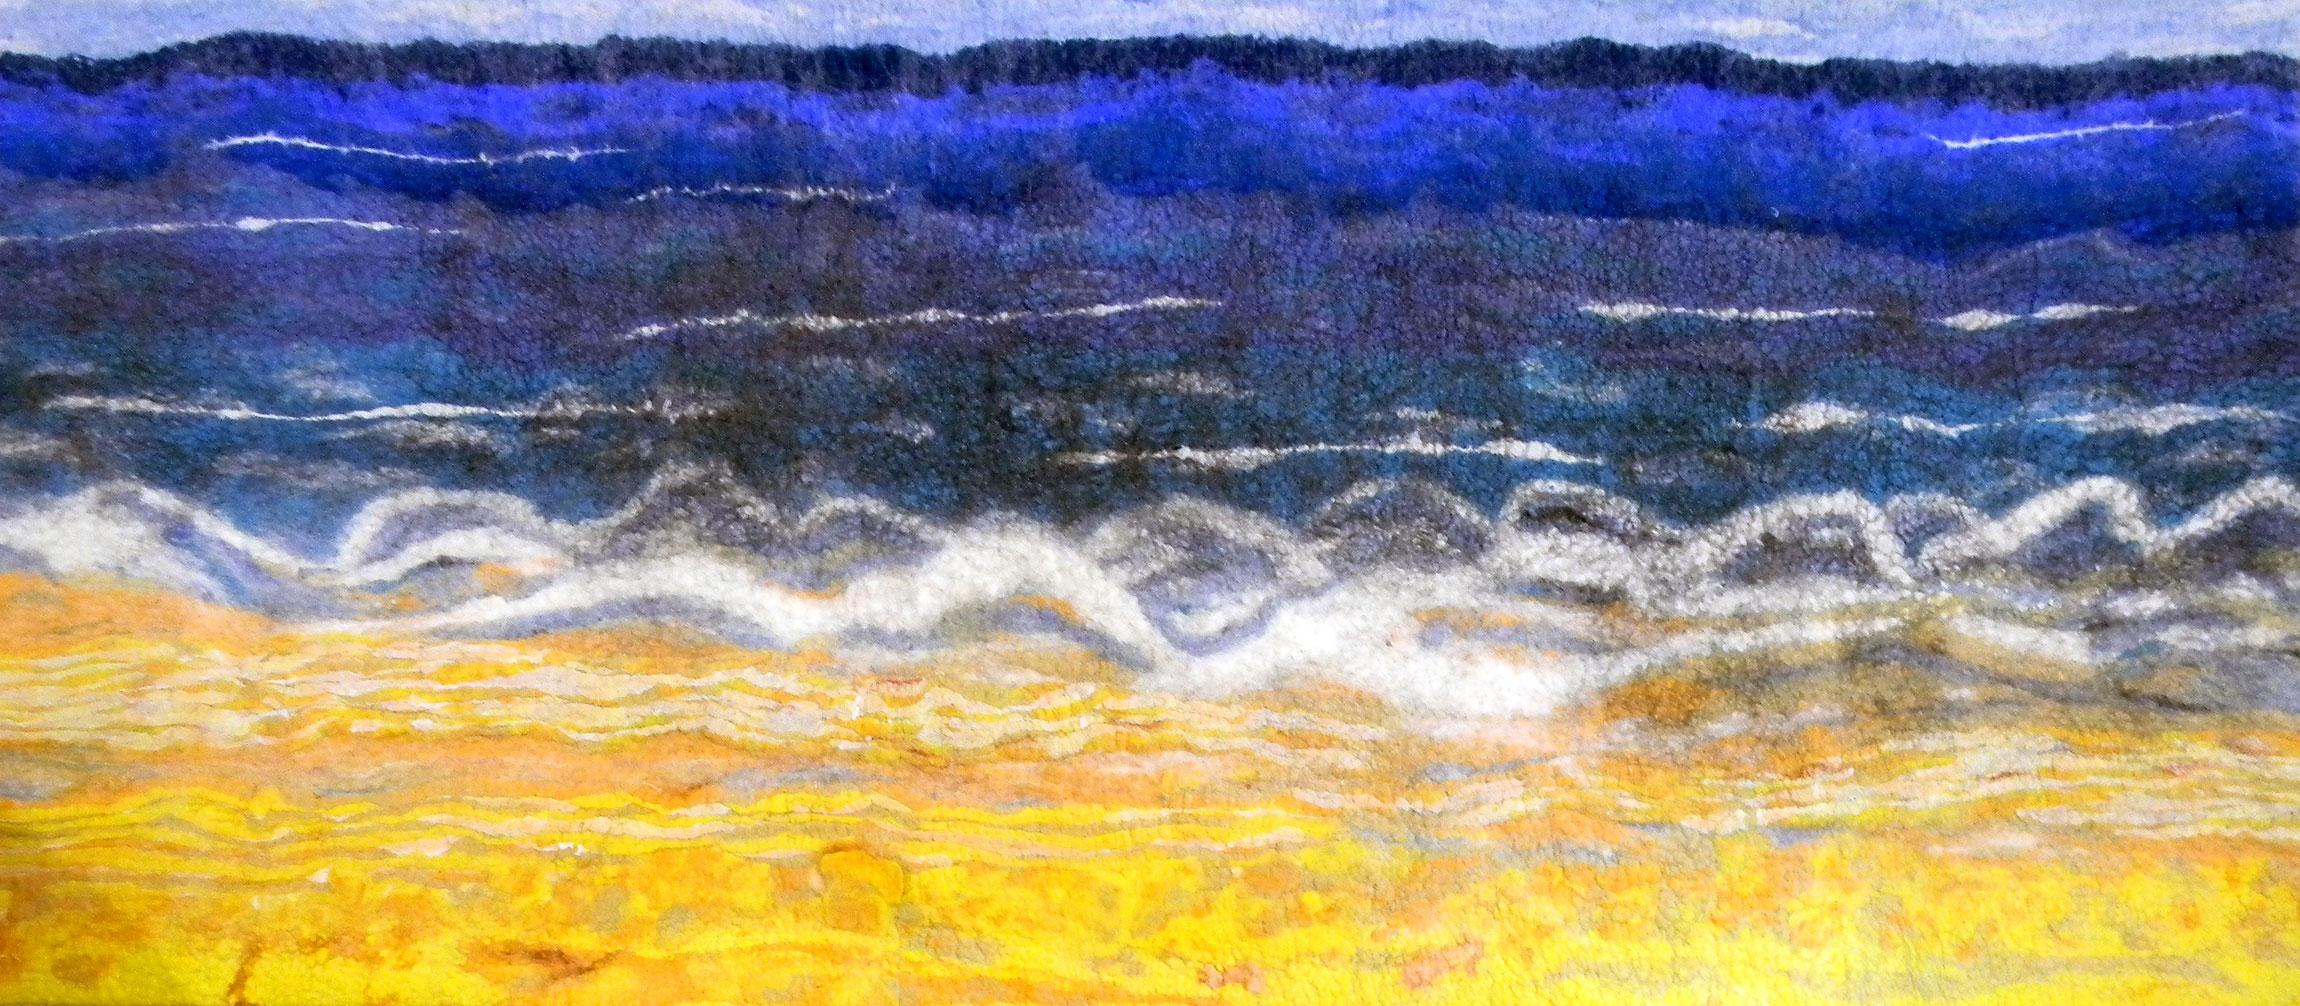 Wool felt Artworks - Diane Gonthier